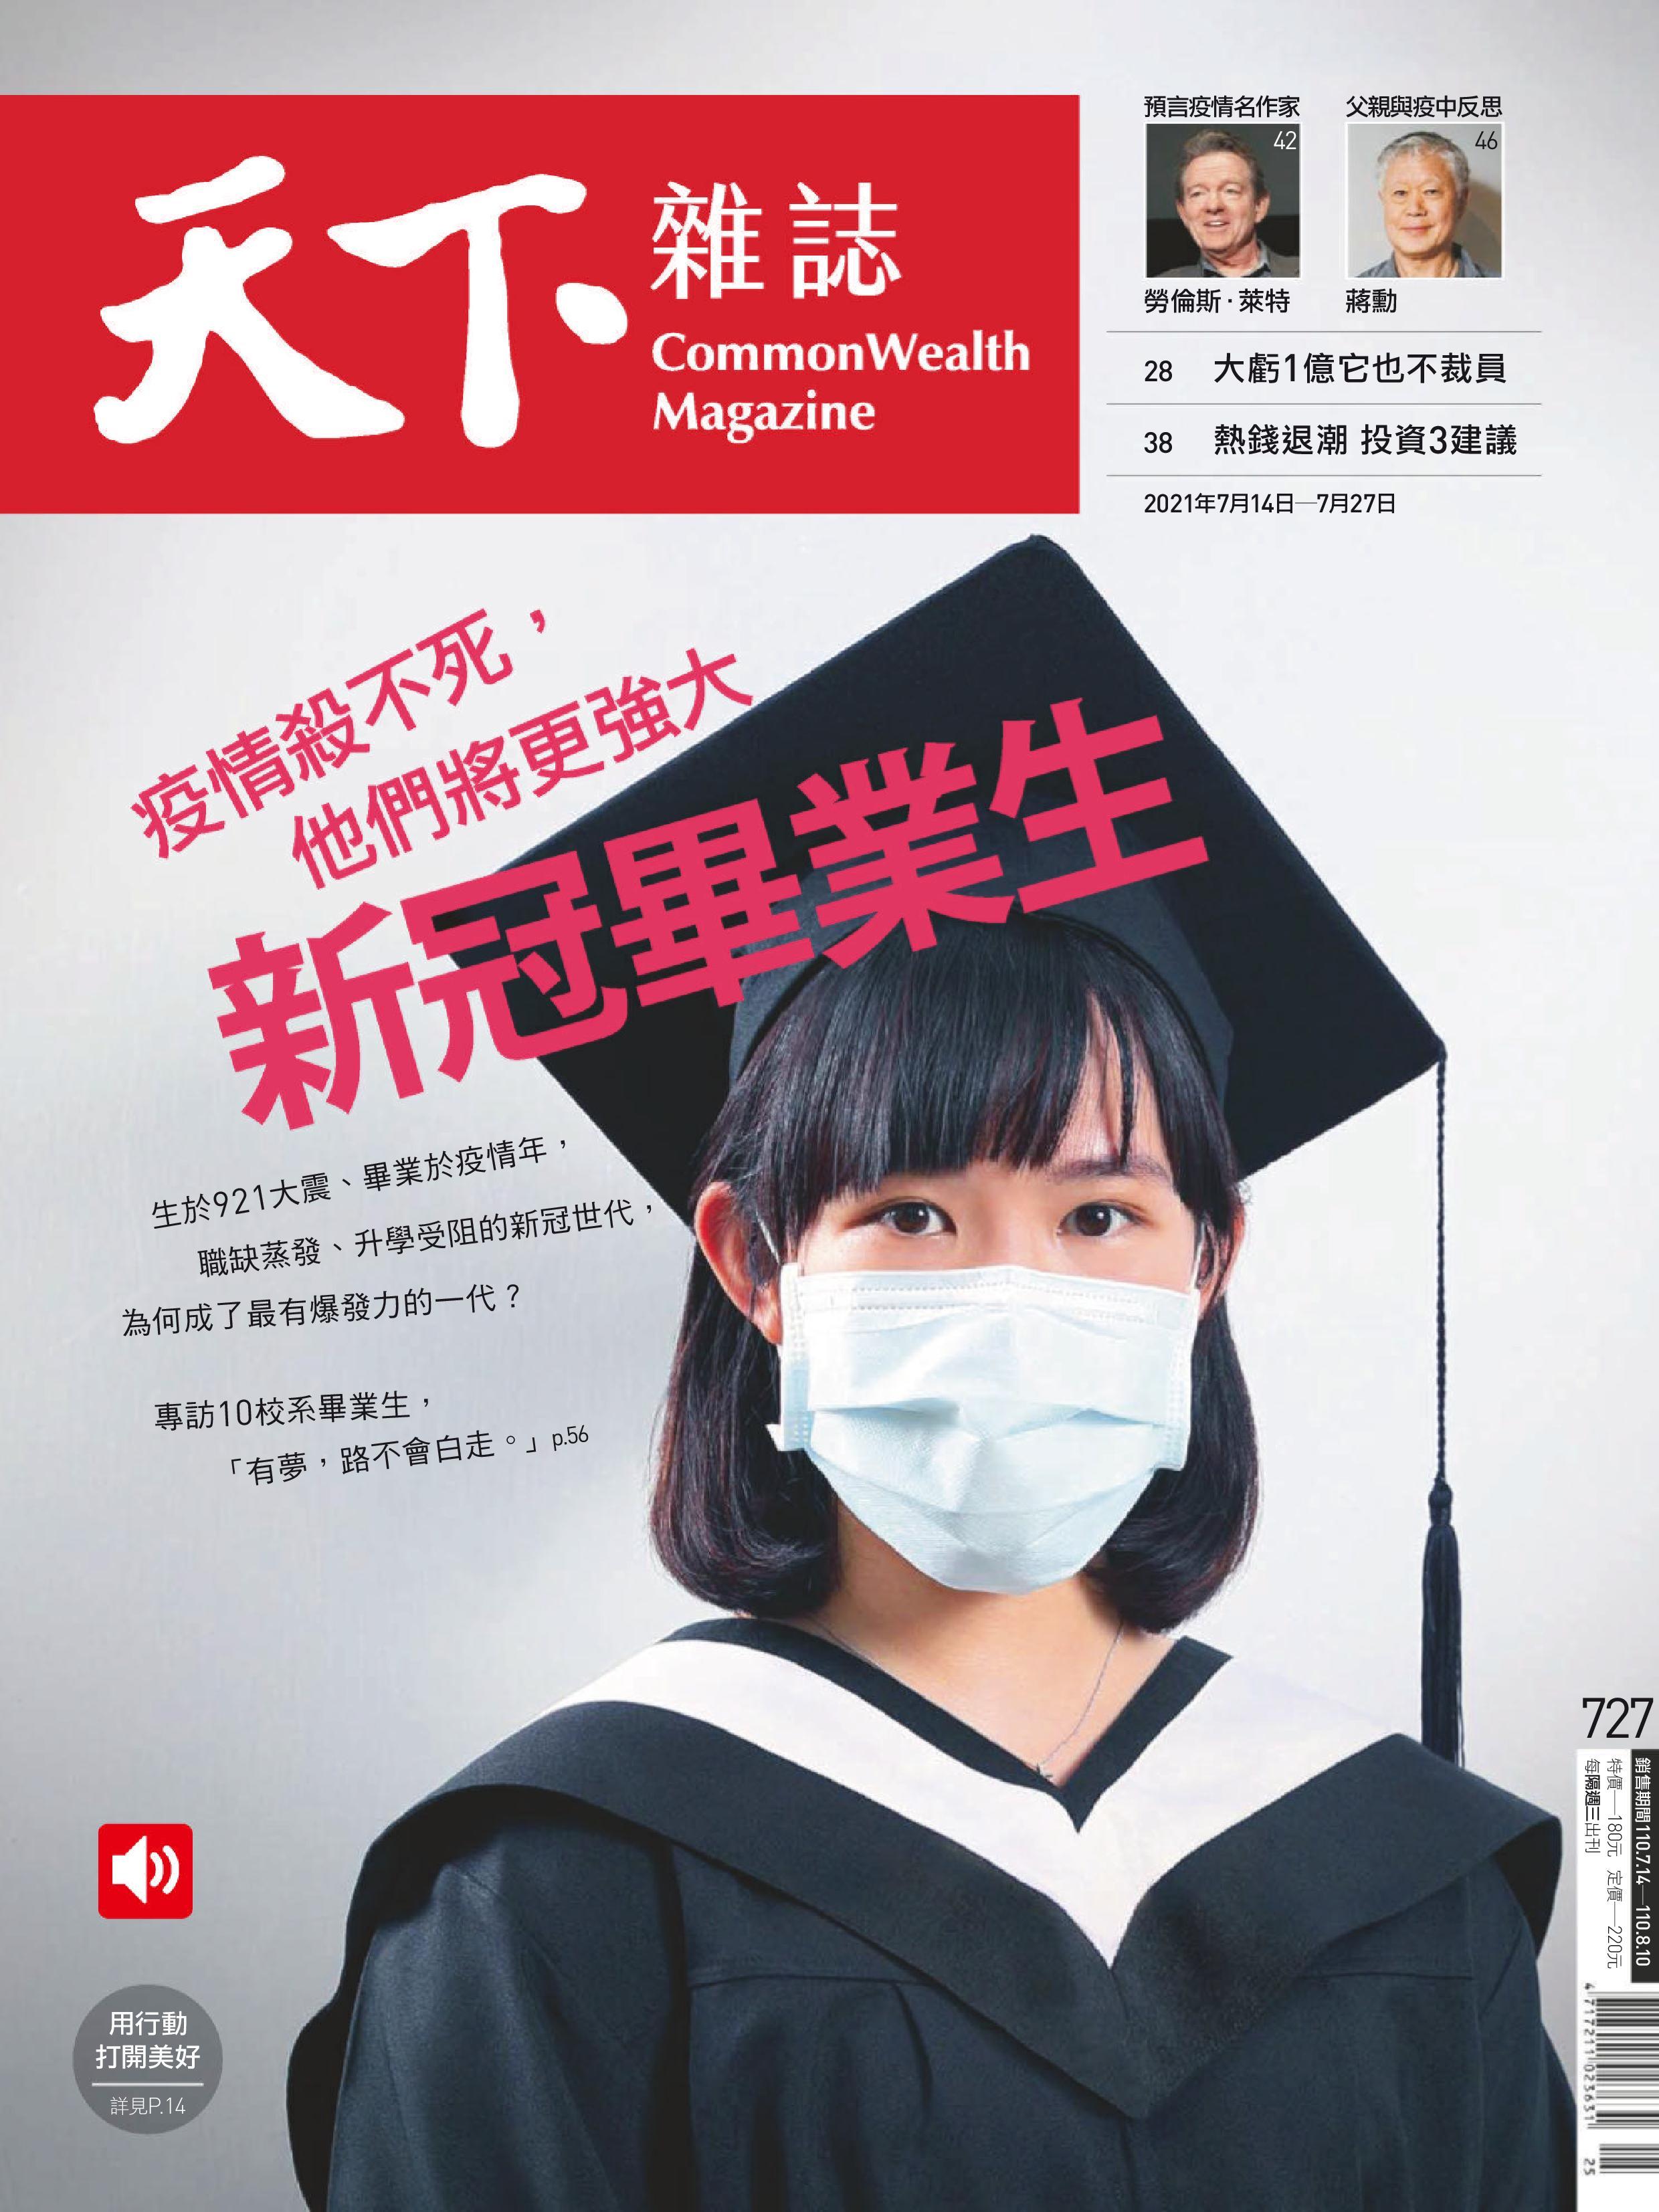 CommonWealth Magazine 天下雜誌 - 七月 14, 2021